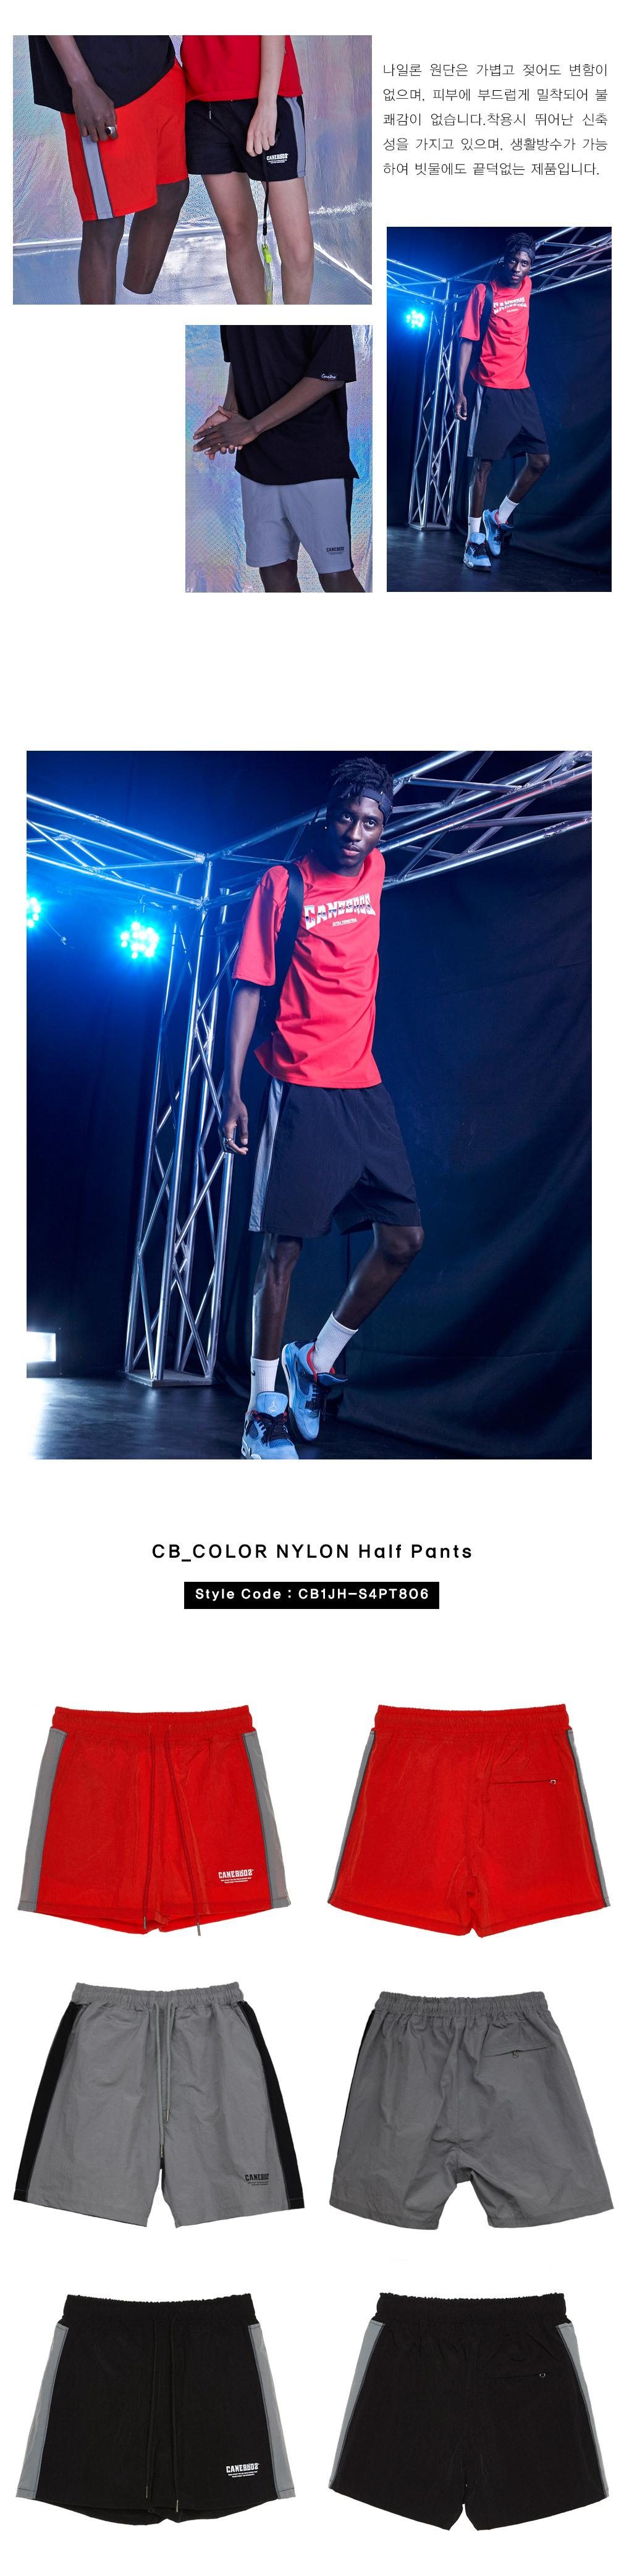 CB_COLOR-NYLON-HALF-PANTS_BK01.jpg